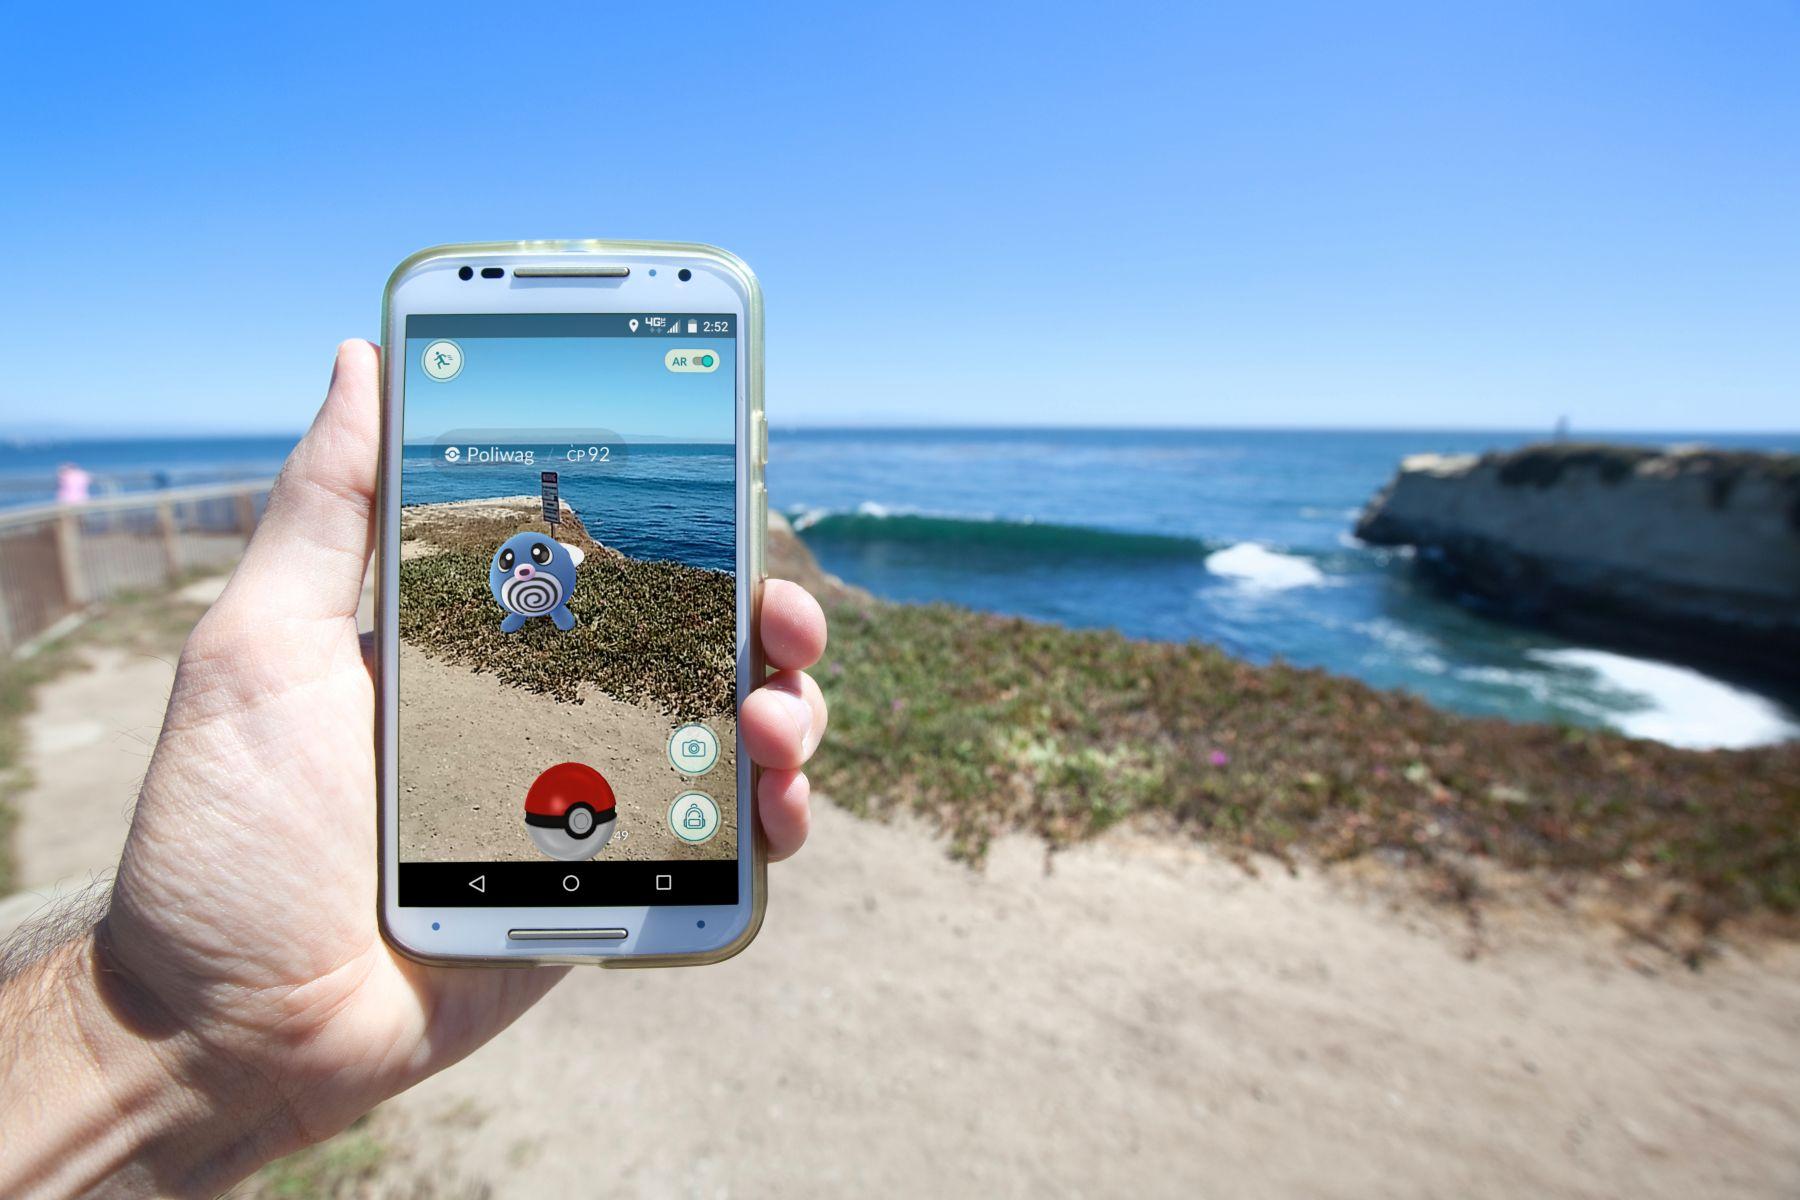 《Pokémon GO》再次挑戰實體活動!「世界地球日」號召全球玩家邊淨灘邊抓寶